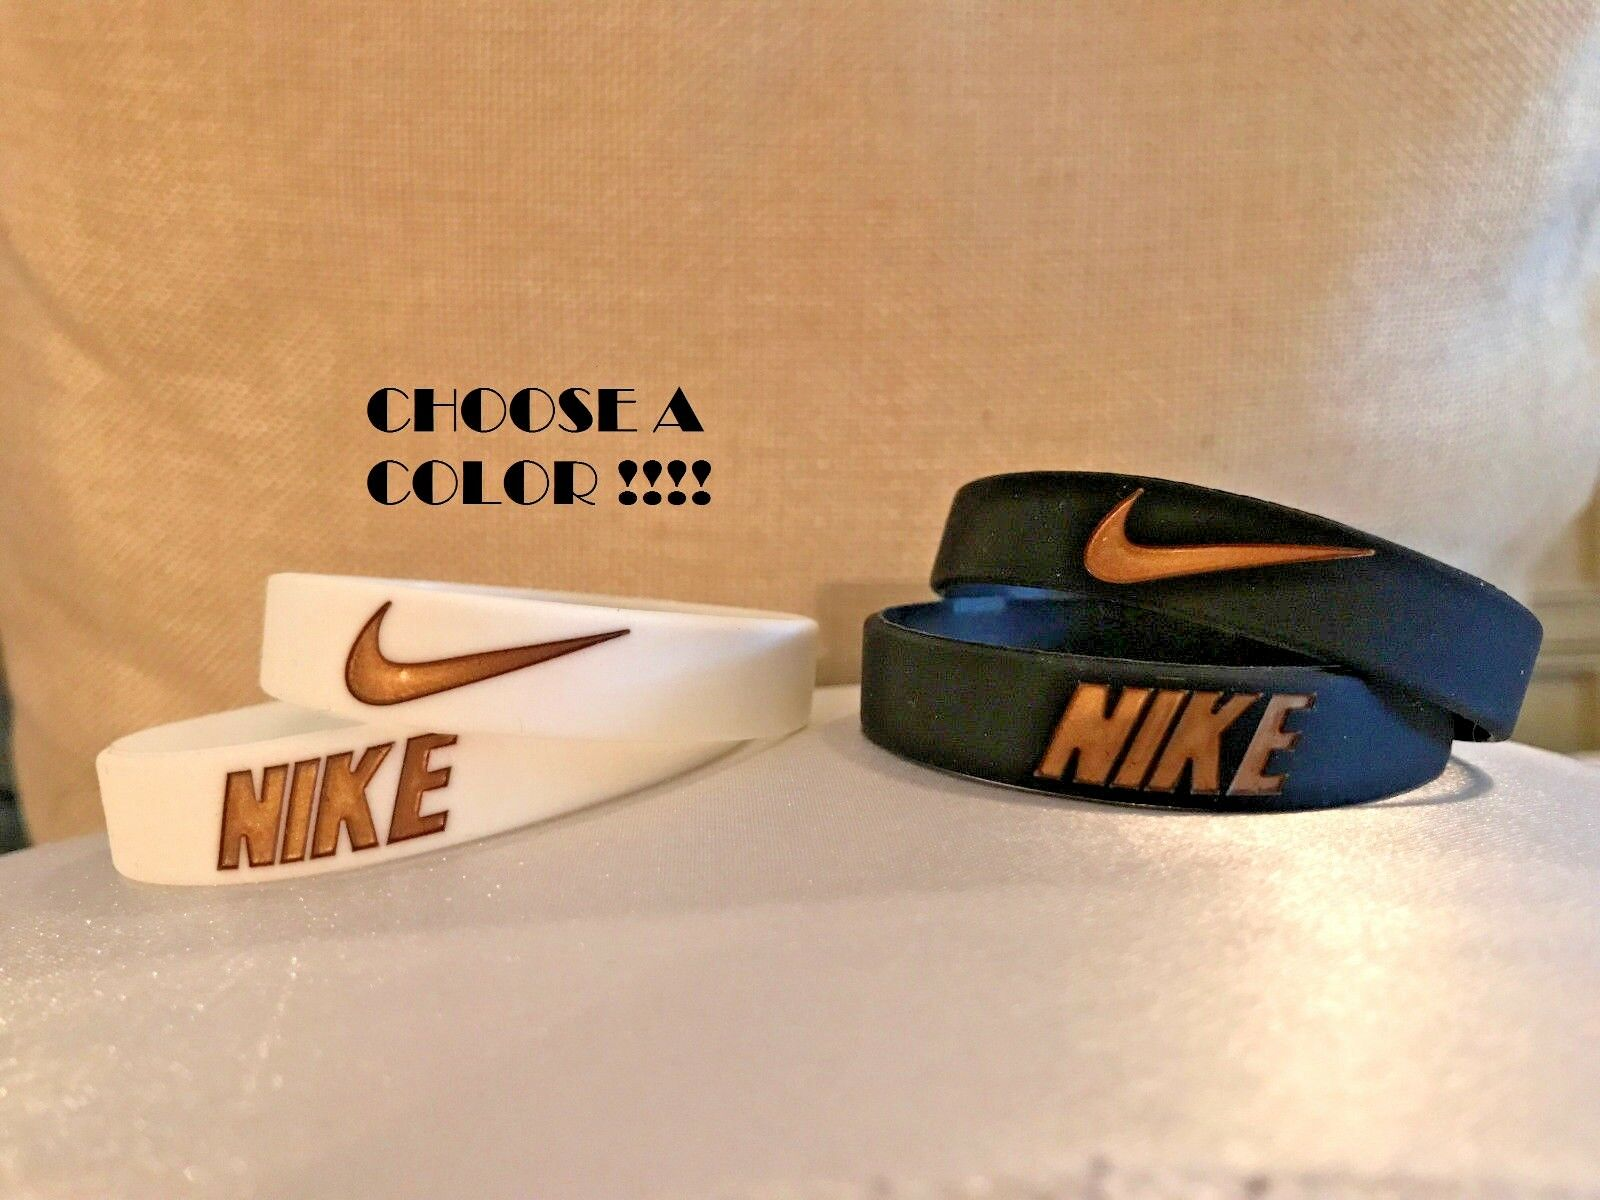 Nike Kobe 10 X jordan Elite Rose Gold 718763-091 jordan X beethoven Baller Band Bracelet f15830